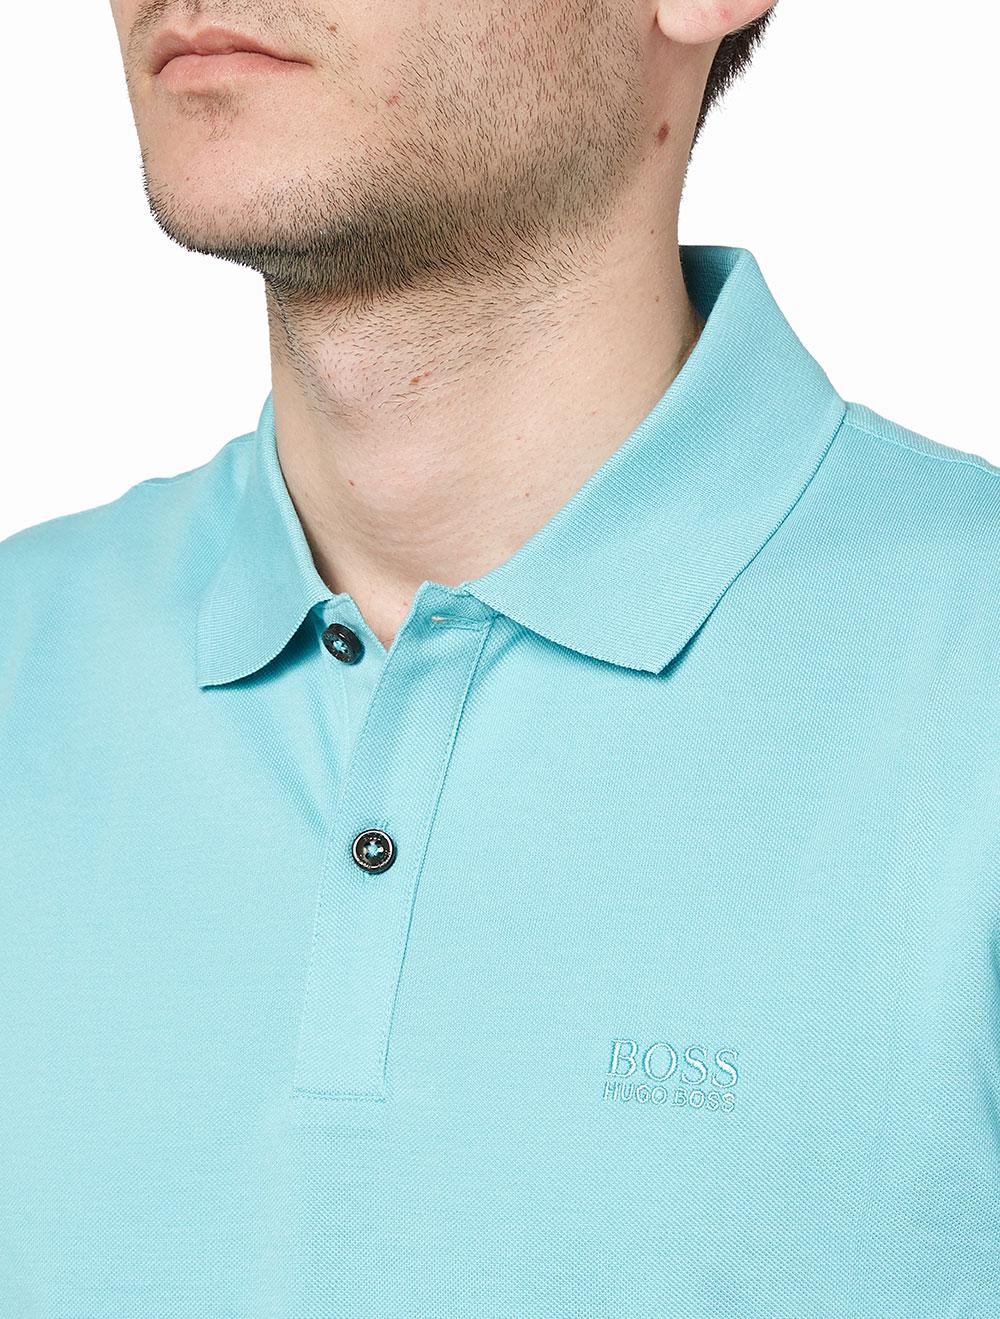 1229e894a18c Boss Γαλάζια  Pallas  Polo Μπλούζα